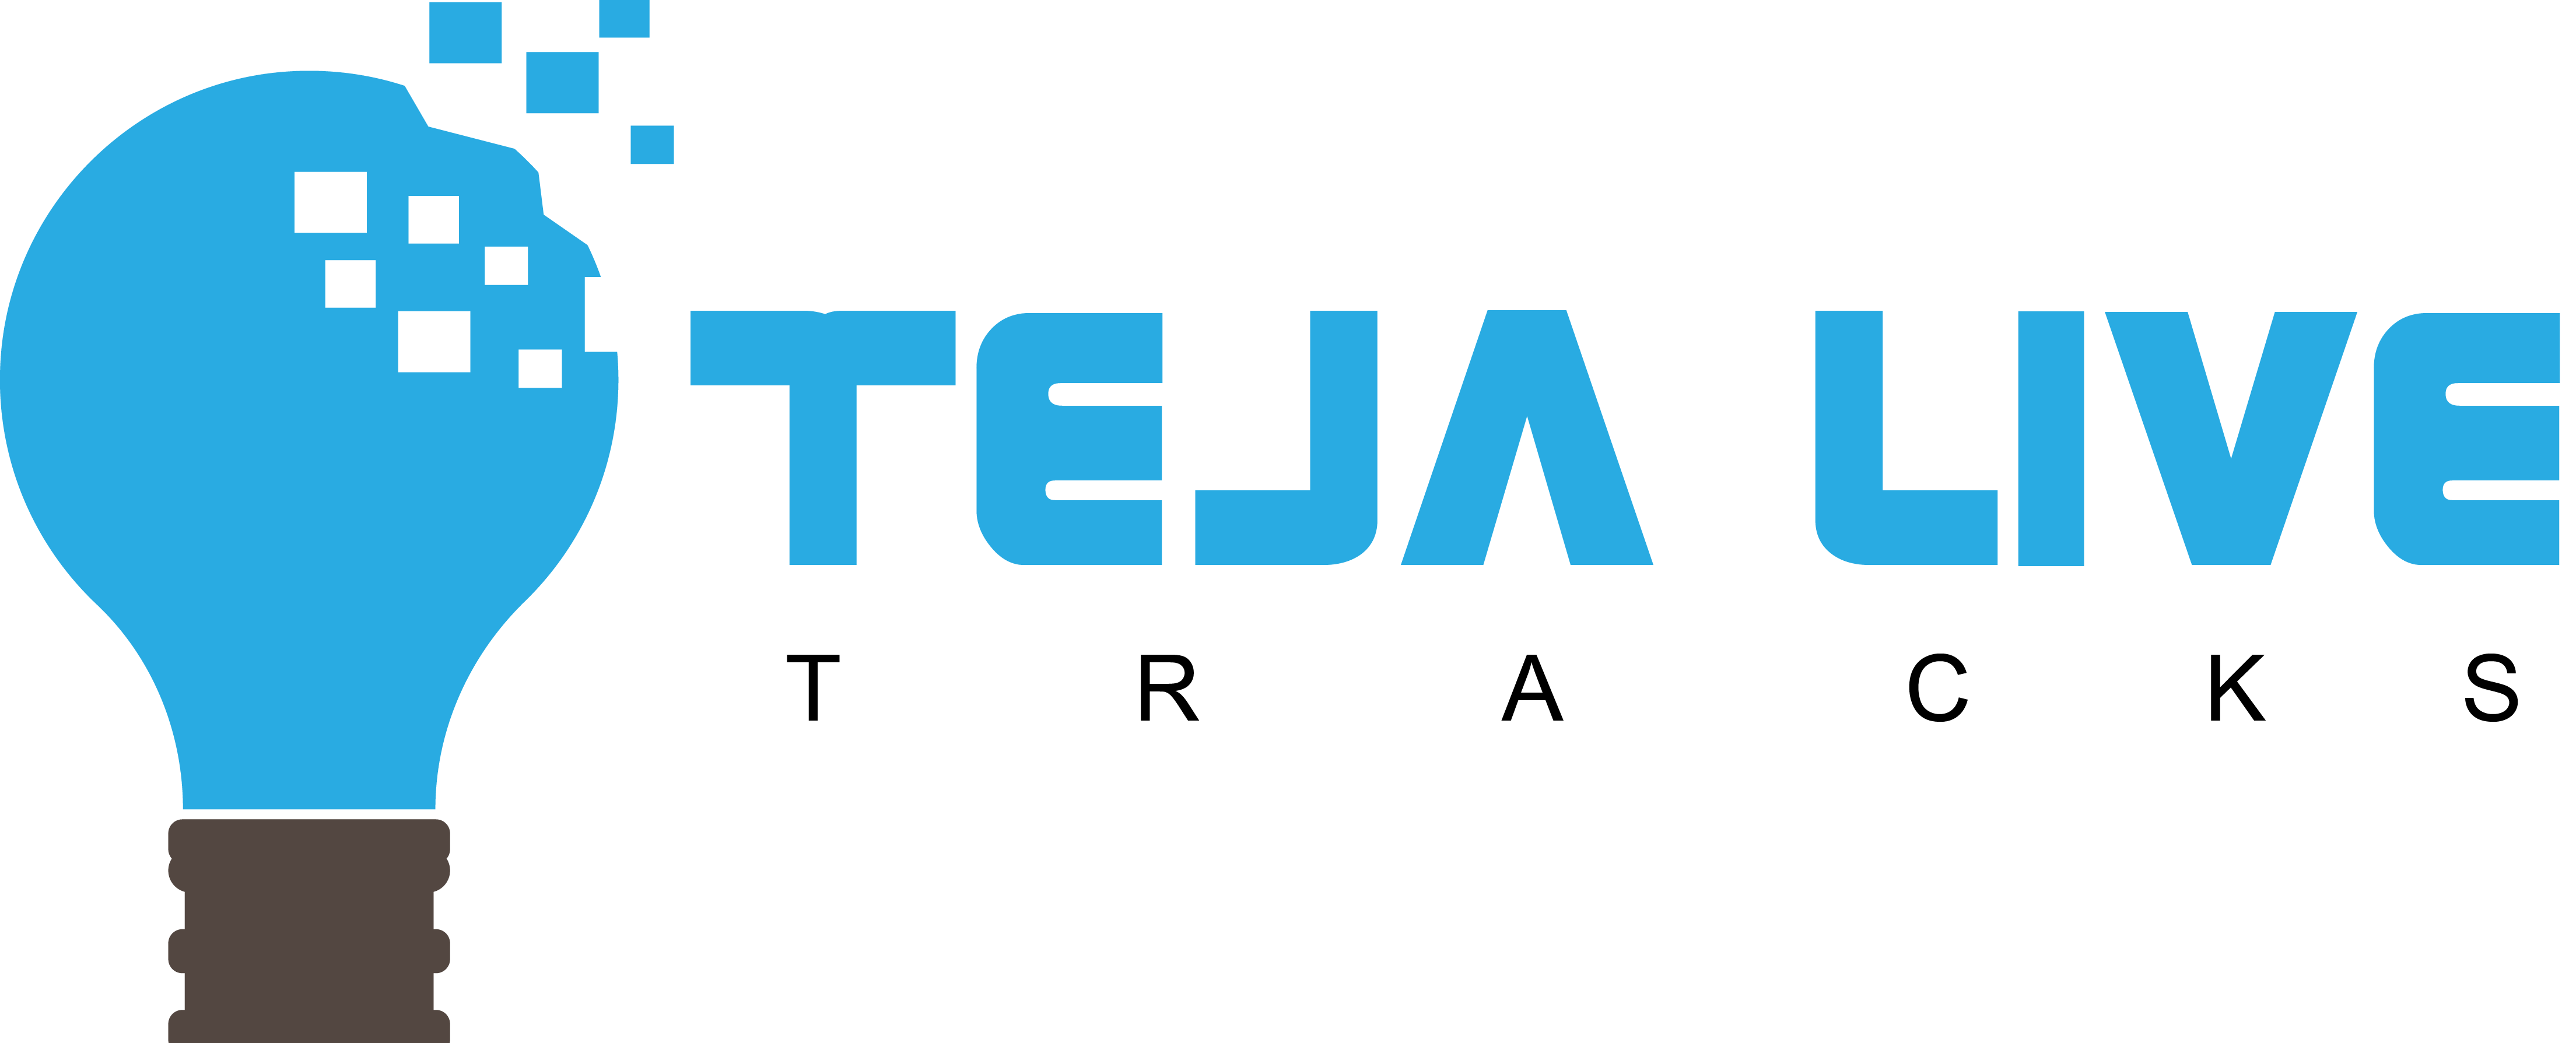 Teja Live Tracks